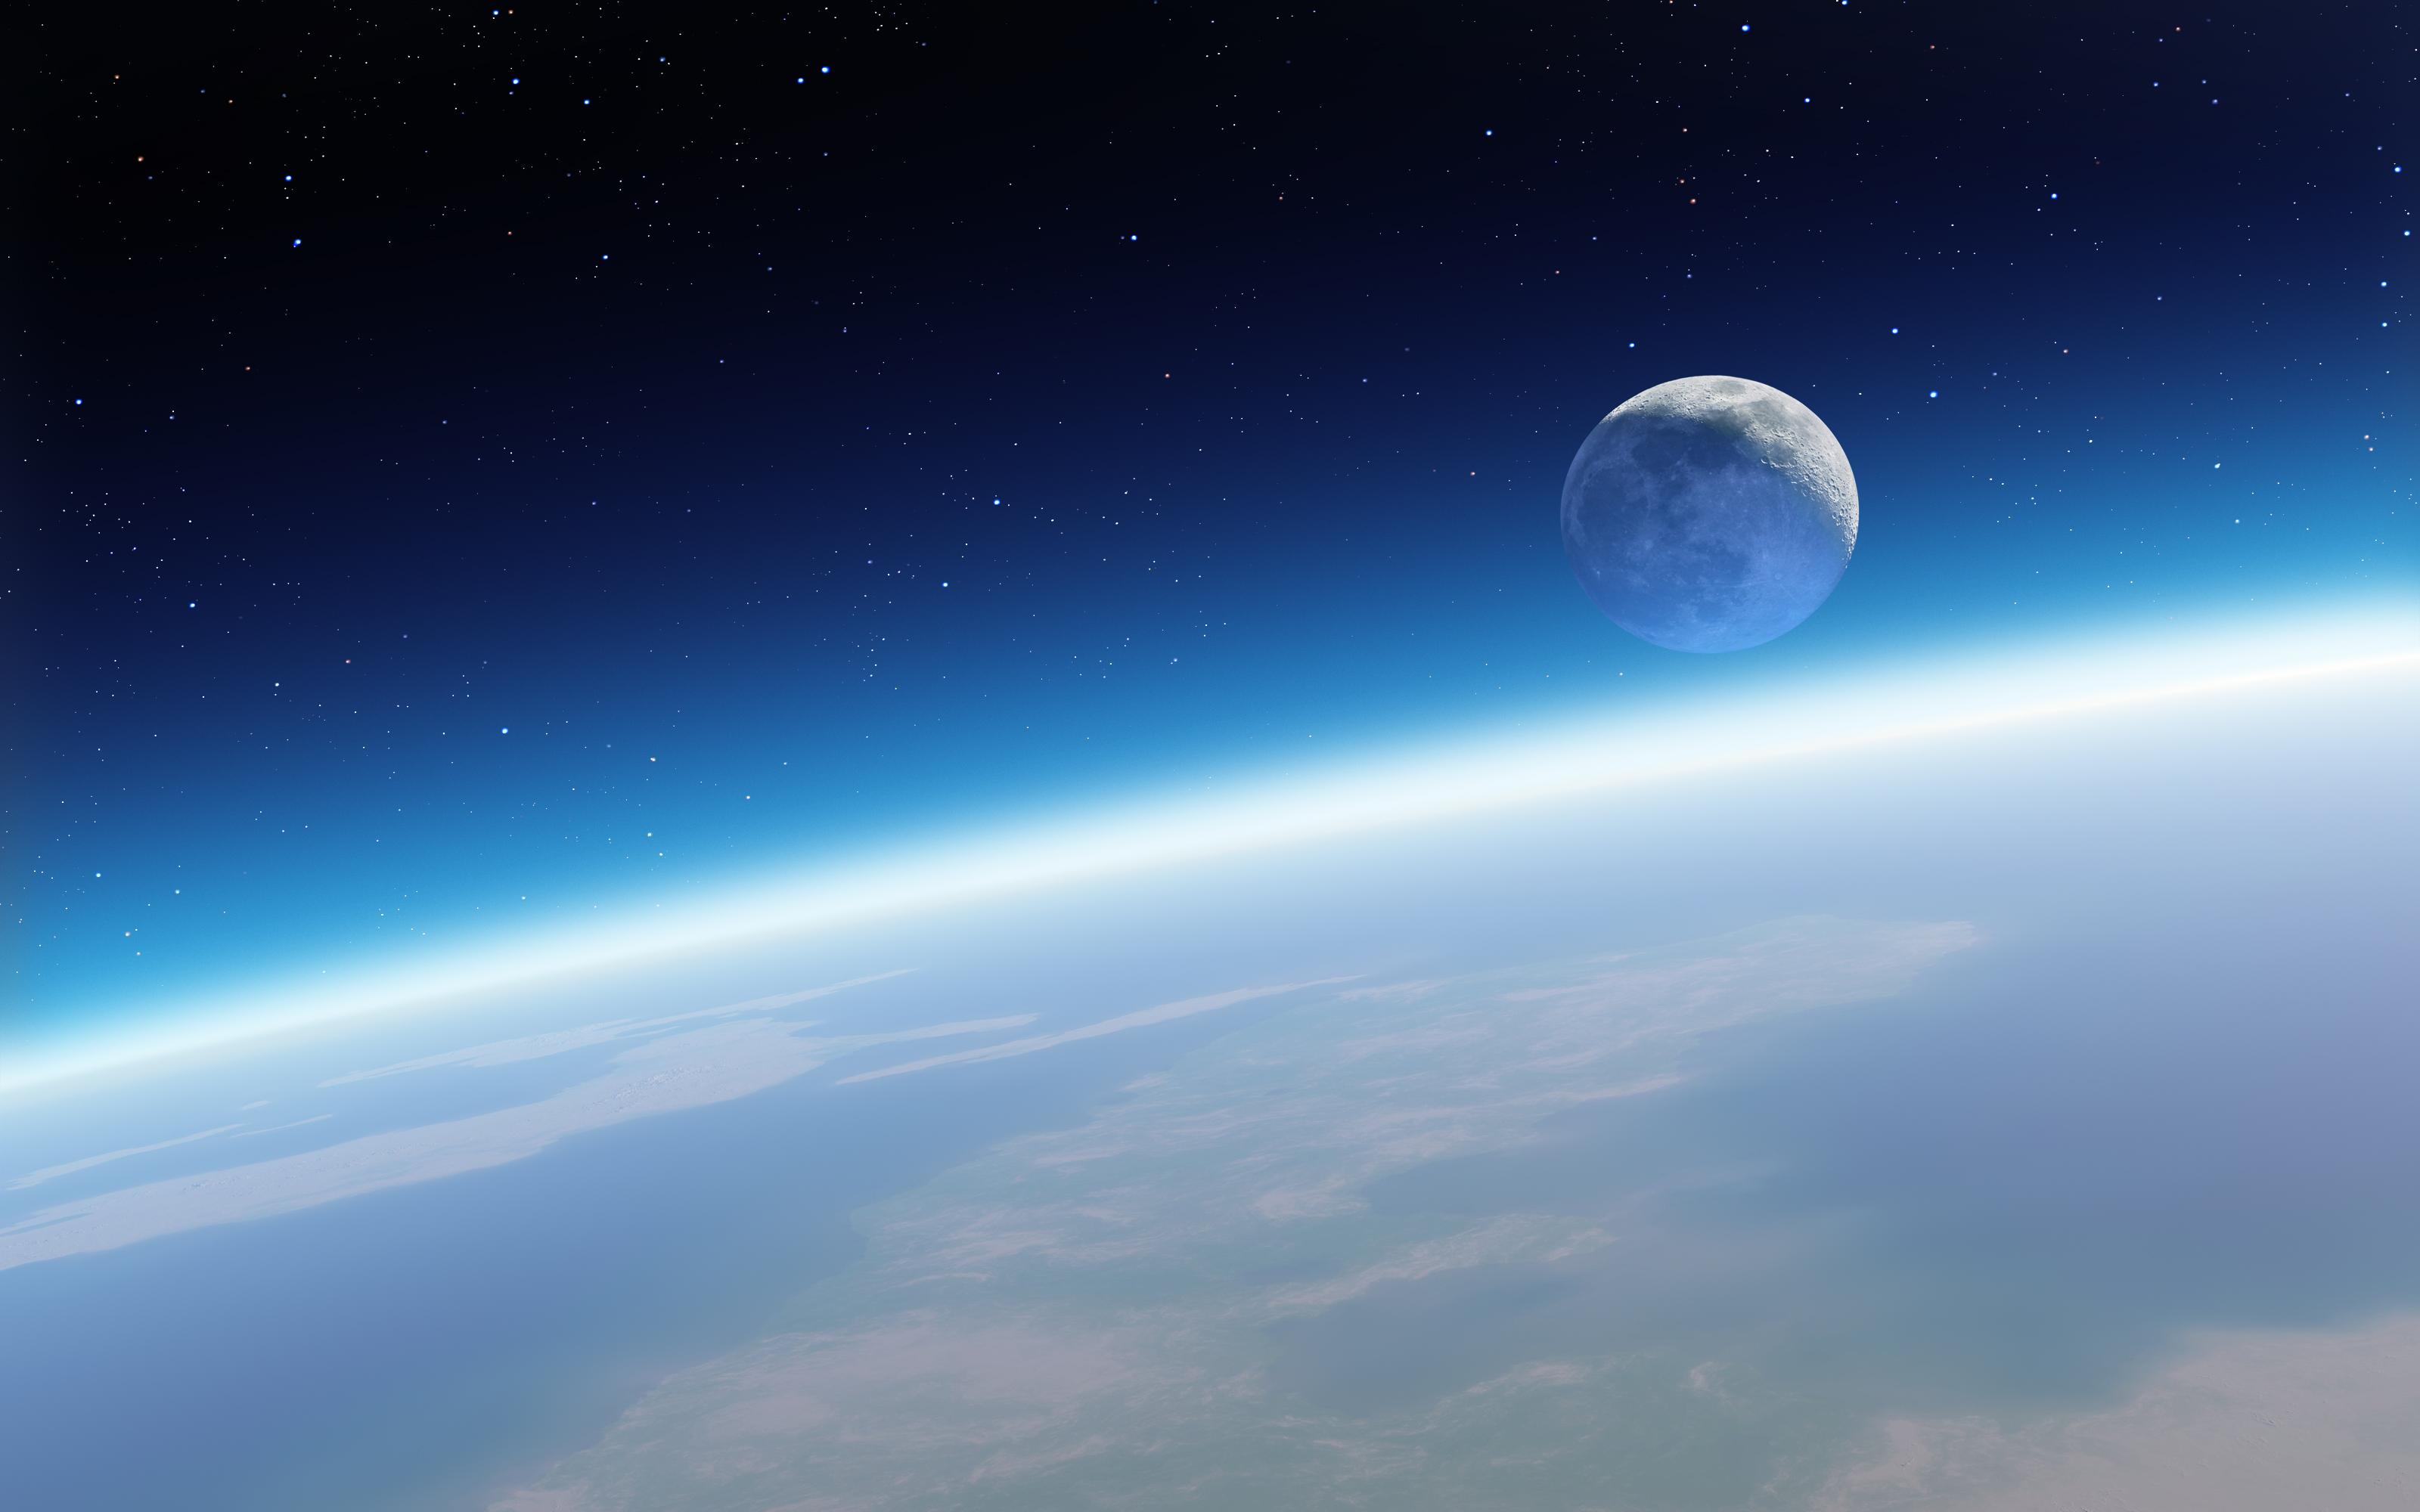 Must see Wallpaper Mac Space - Earth_and_Moon  2018_951126.jpg